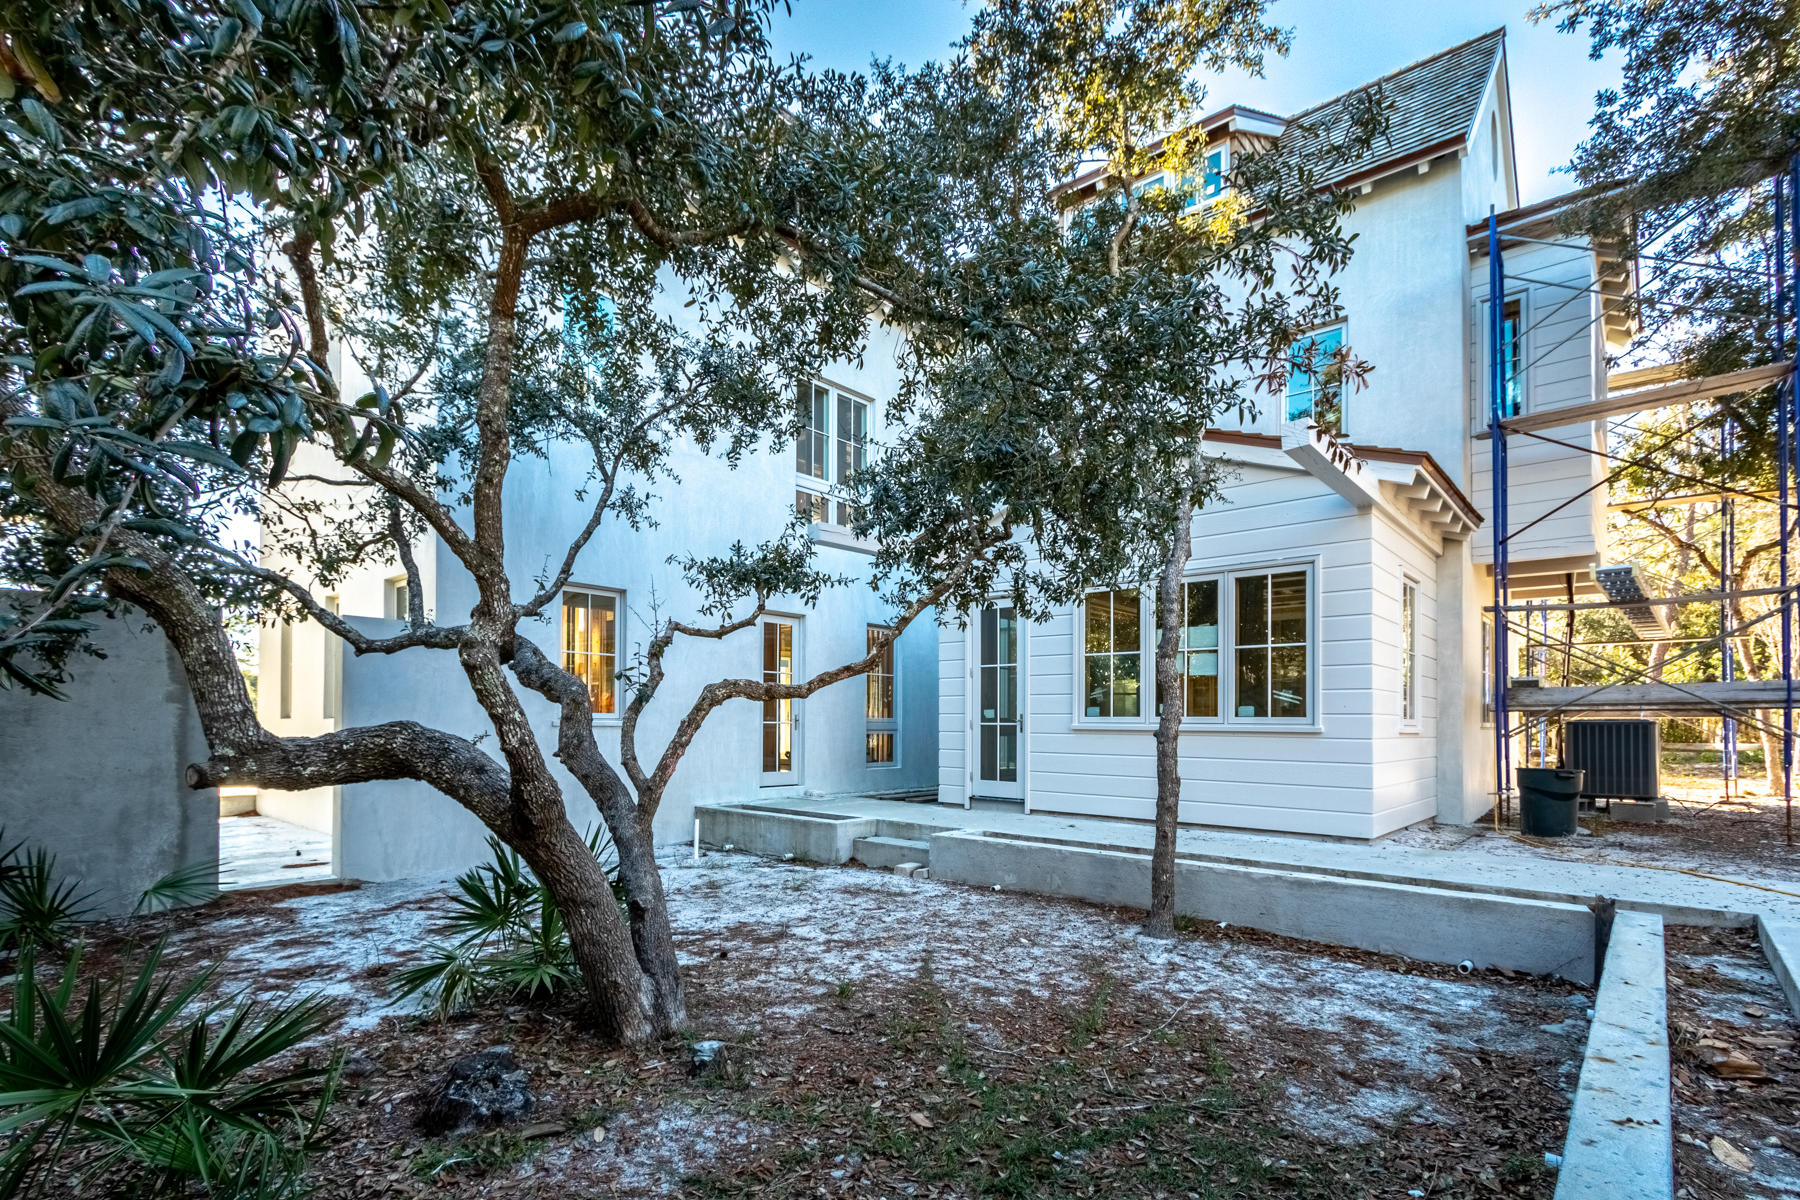 Courtyard with Beautiful Live Oak